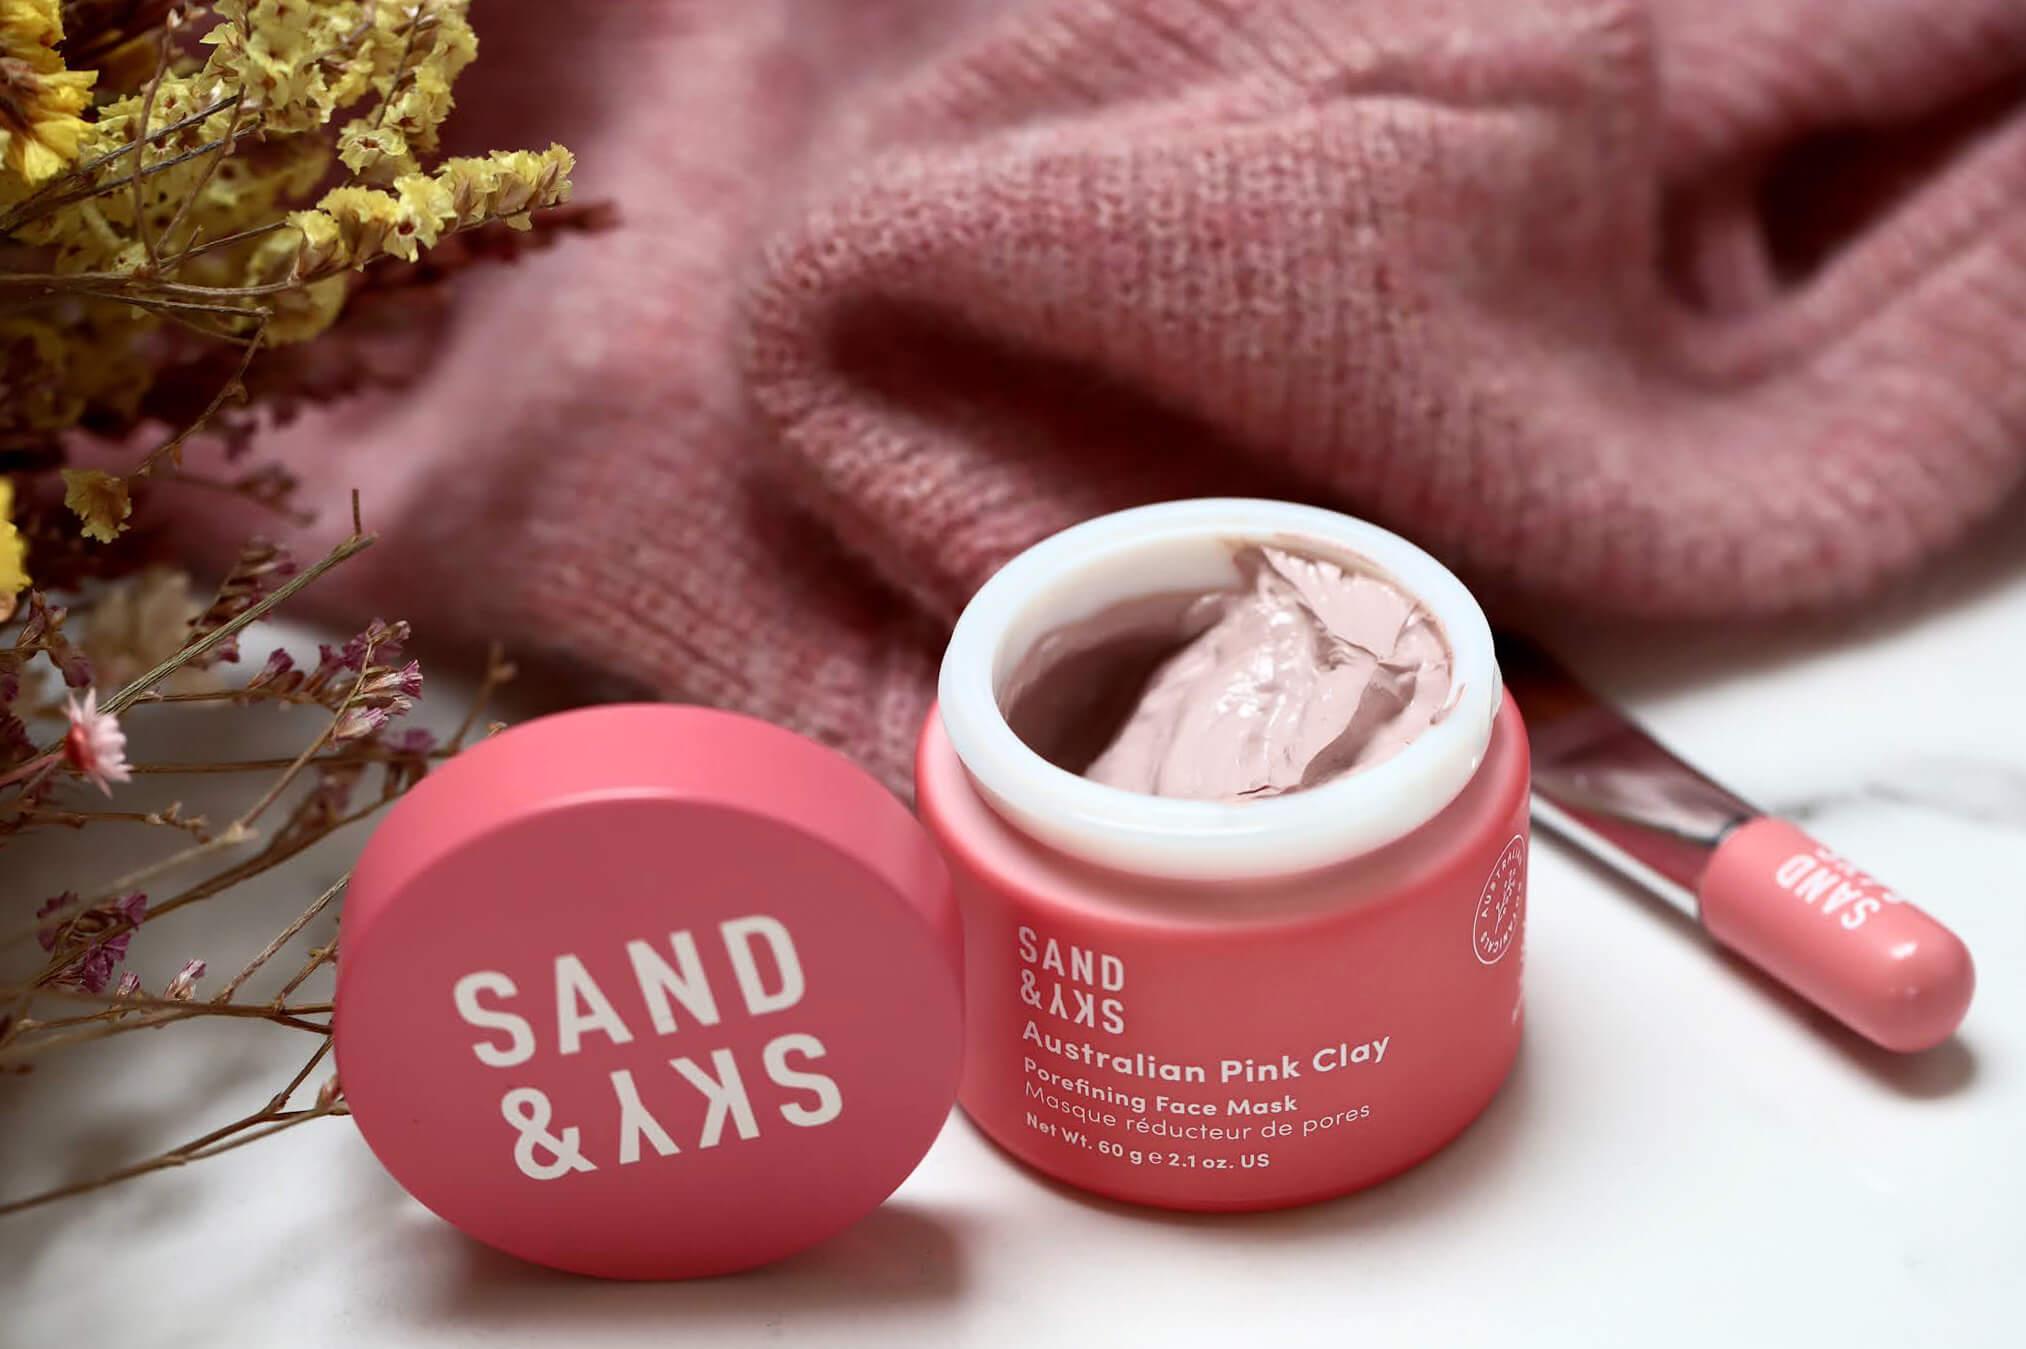 Sand Sky Australian Pink Clay Masque Reducteur de Pores